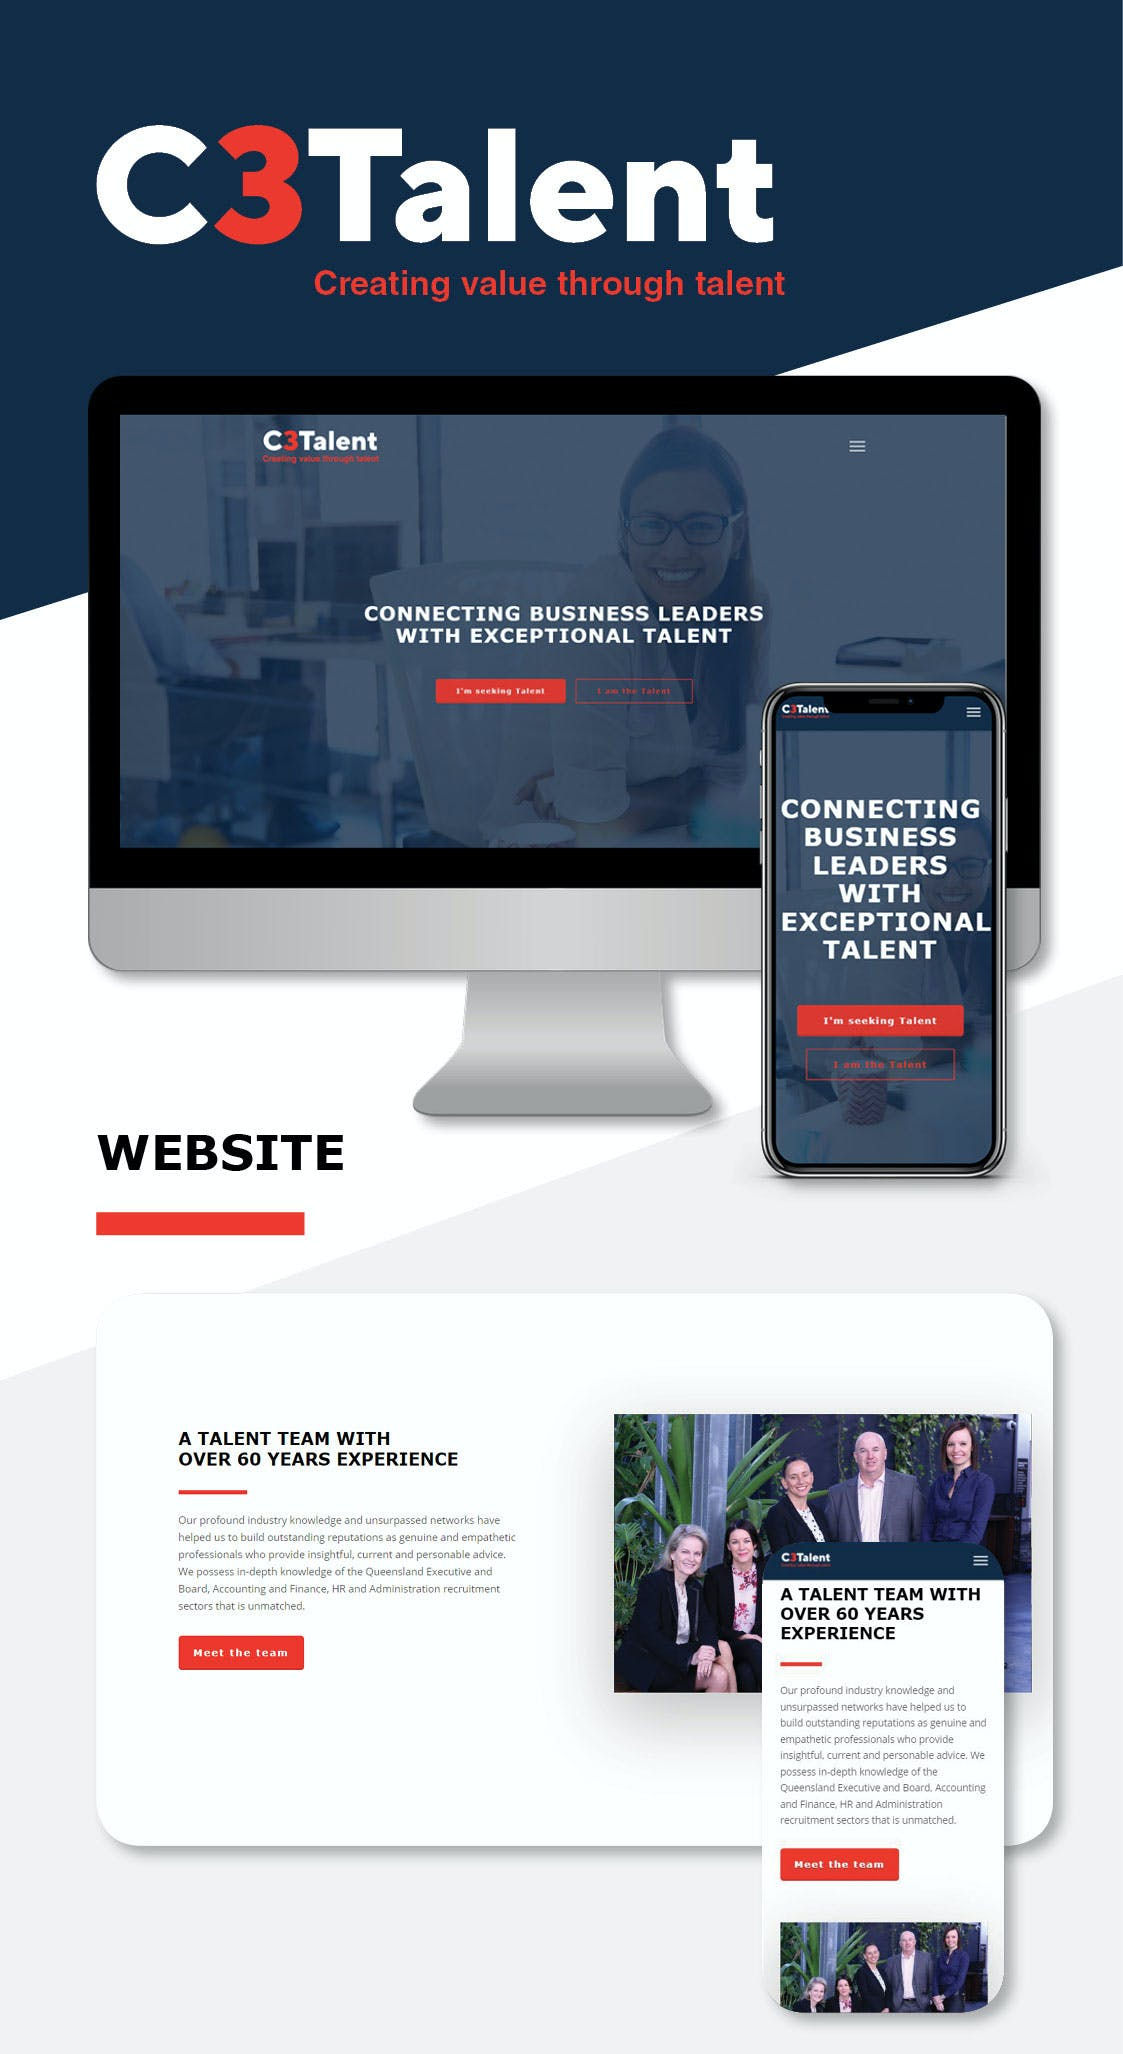 C3Talent Case Study Website